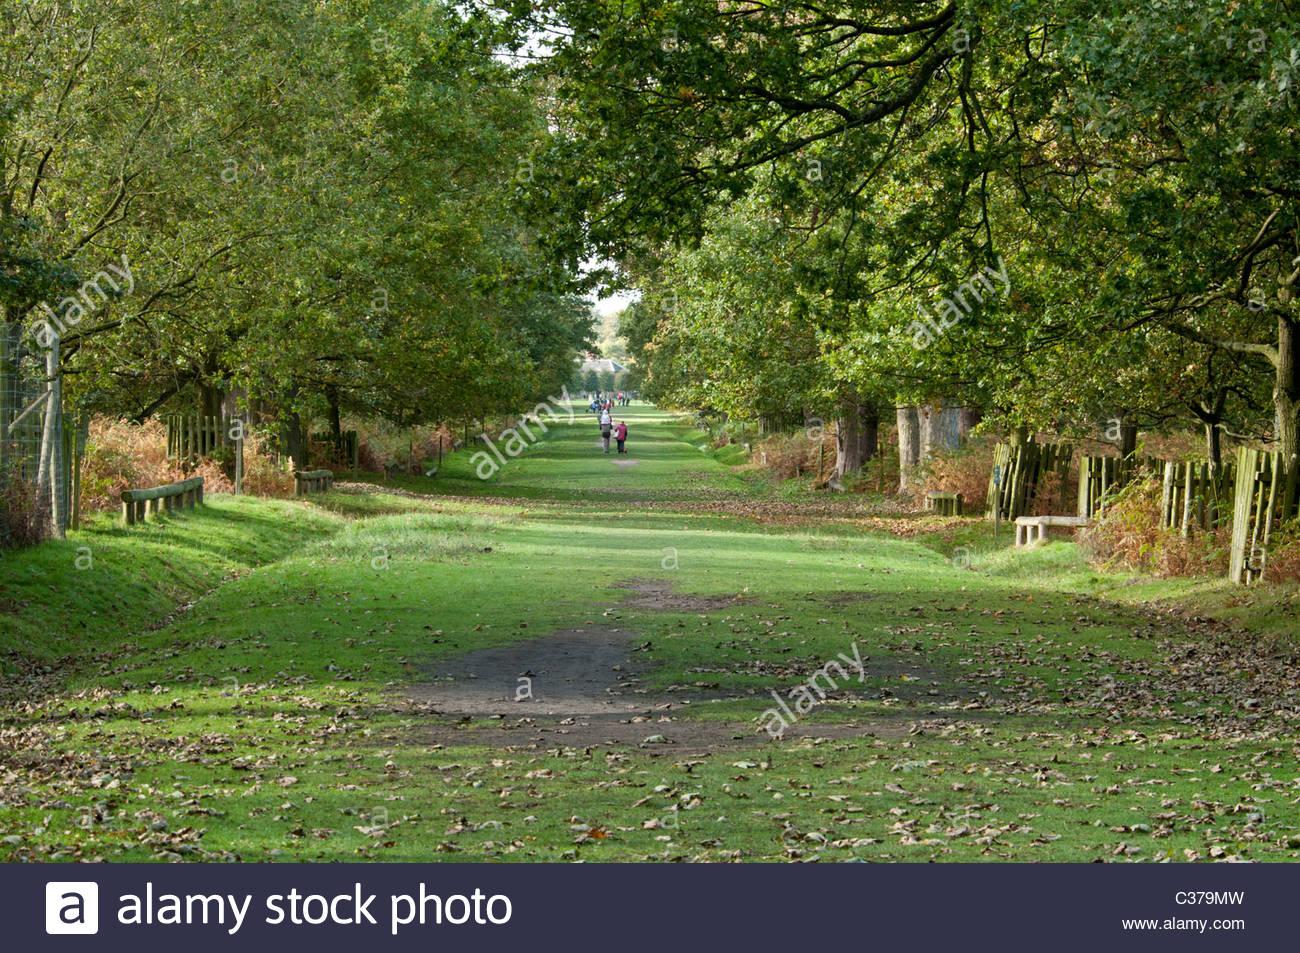 Tree lined drive on Dunham Massey estate. - Stock Image